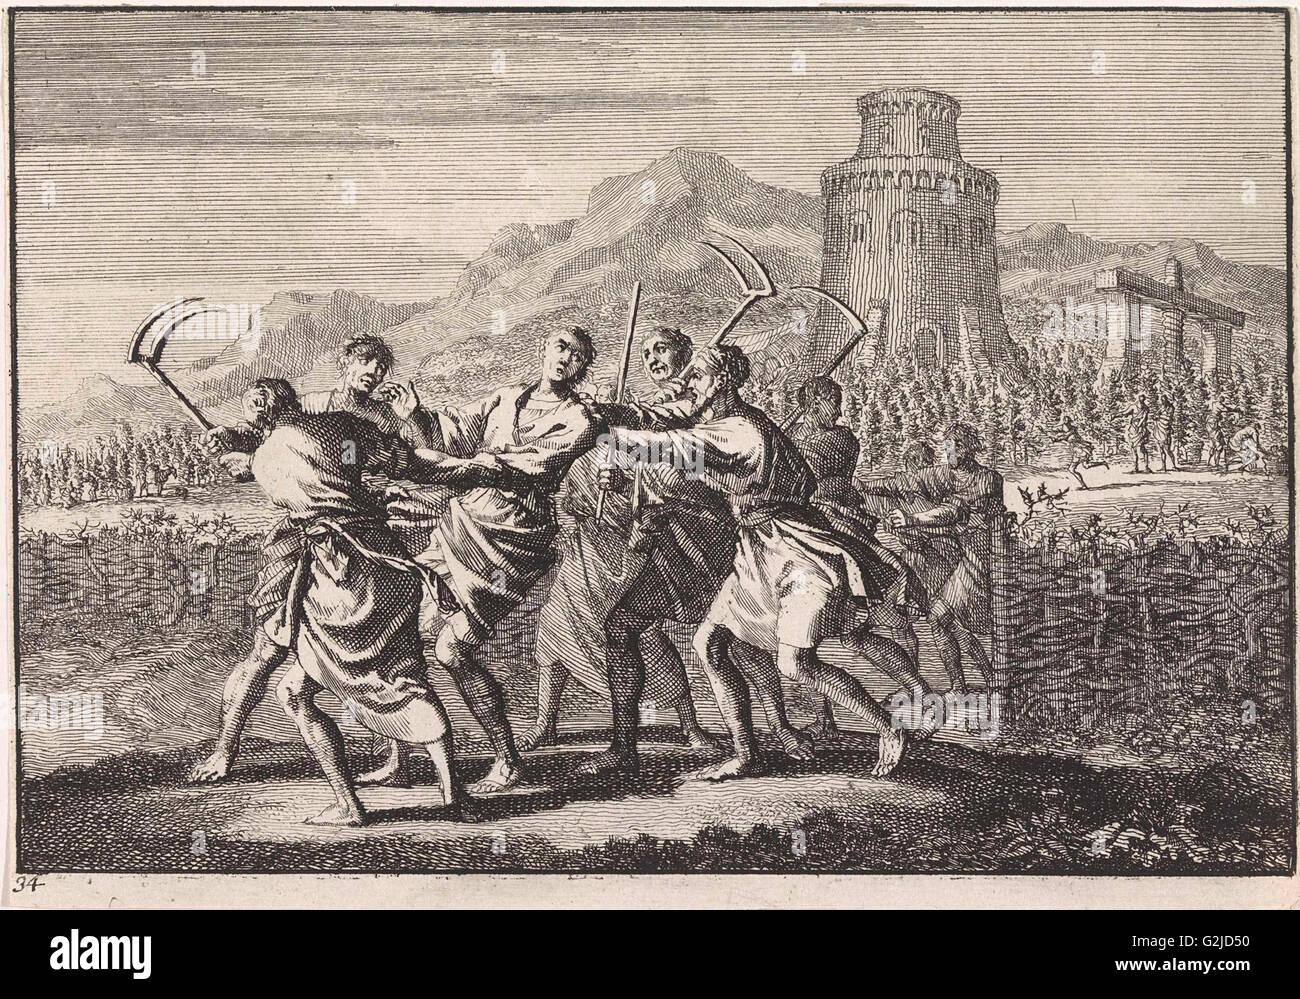 Parable of the tenants of the vineyard, Jan Luyken, 1703 - Stock Image